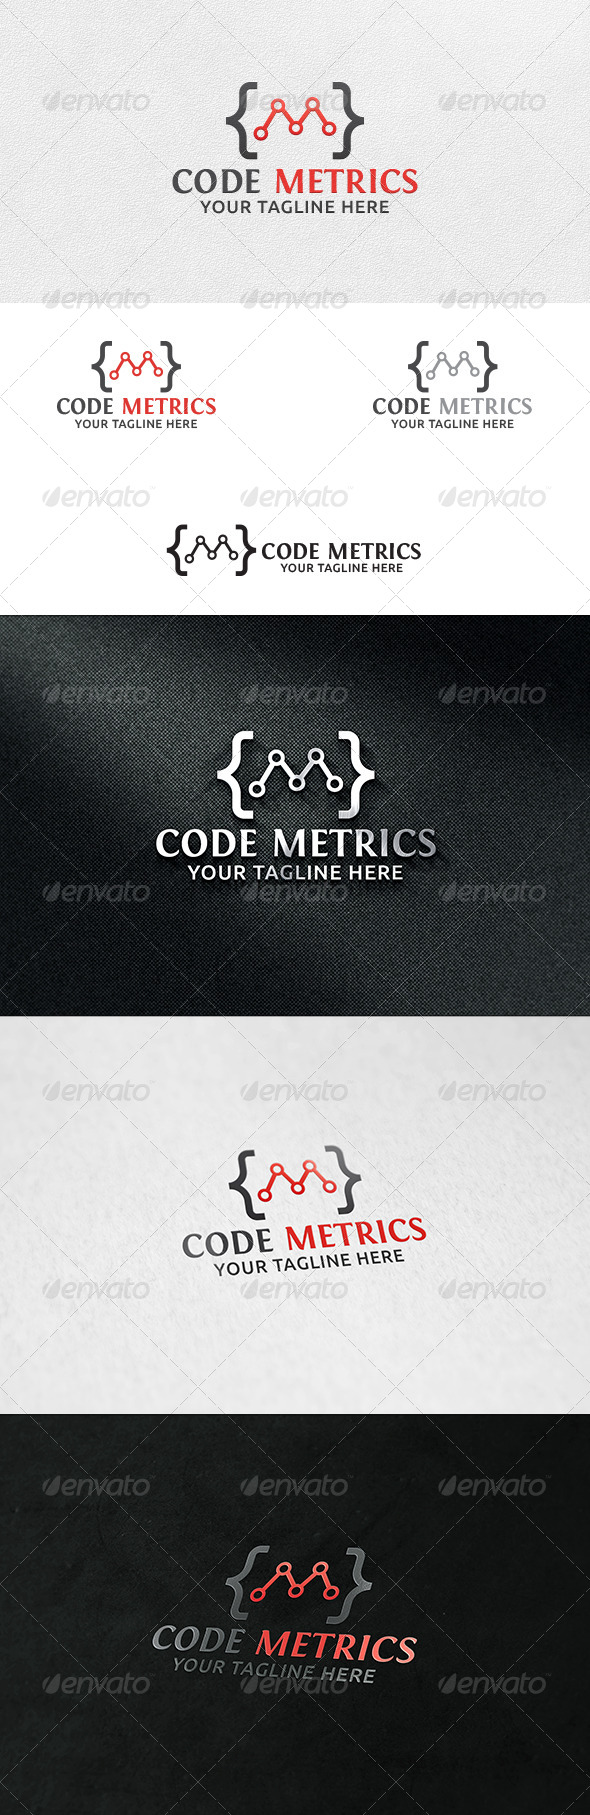 Code Metrics - Logo Template - Symbols Logo Templates